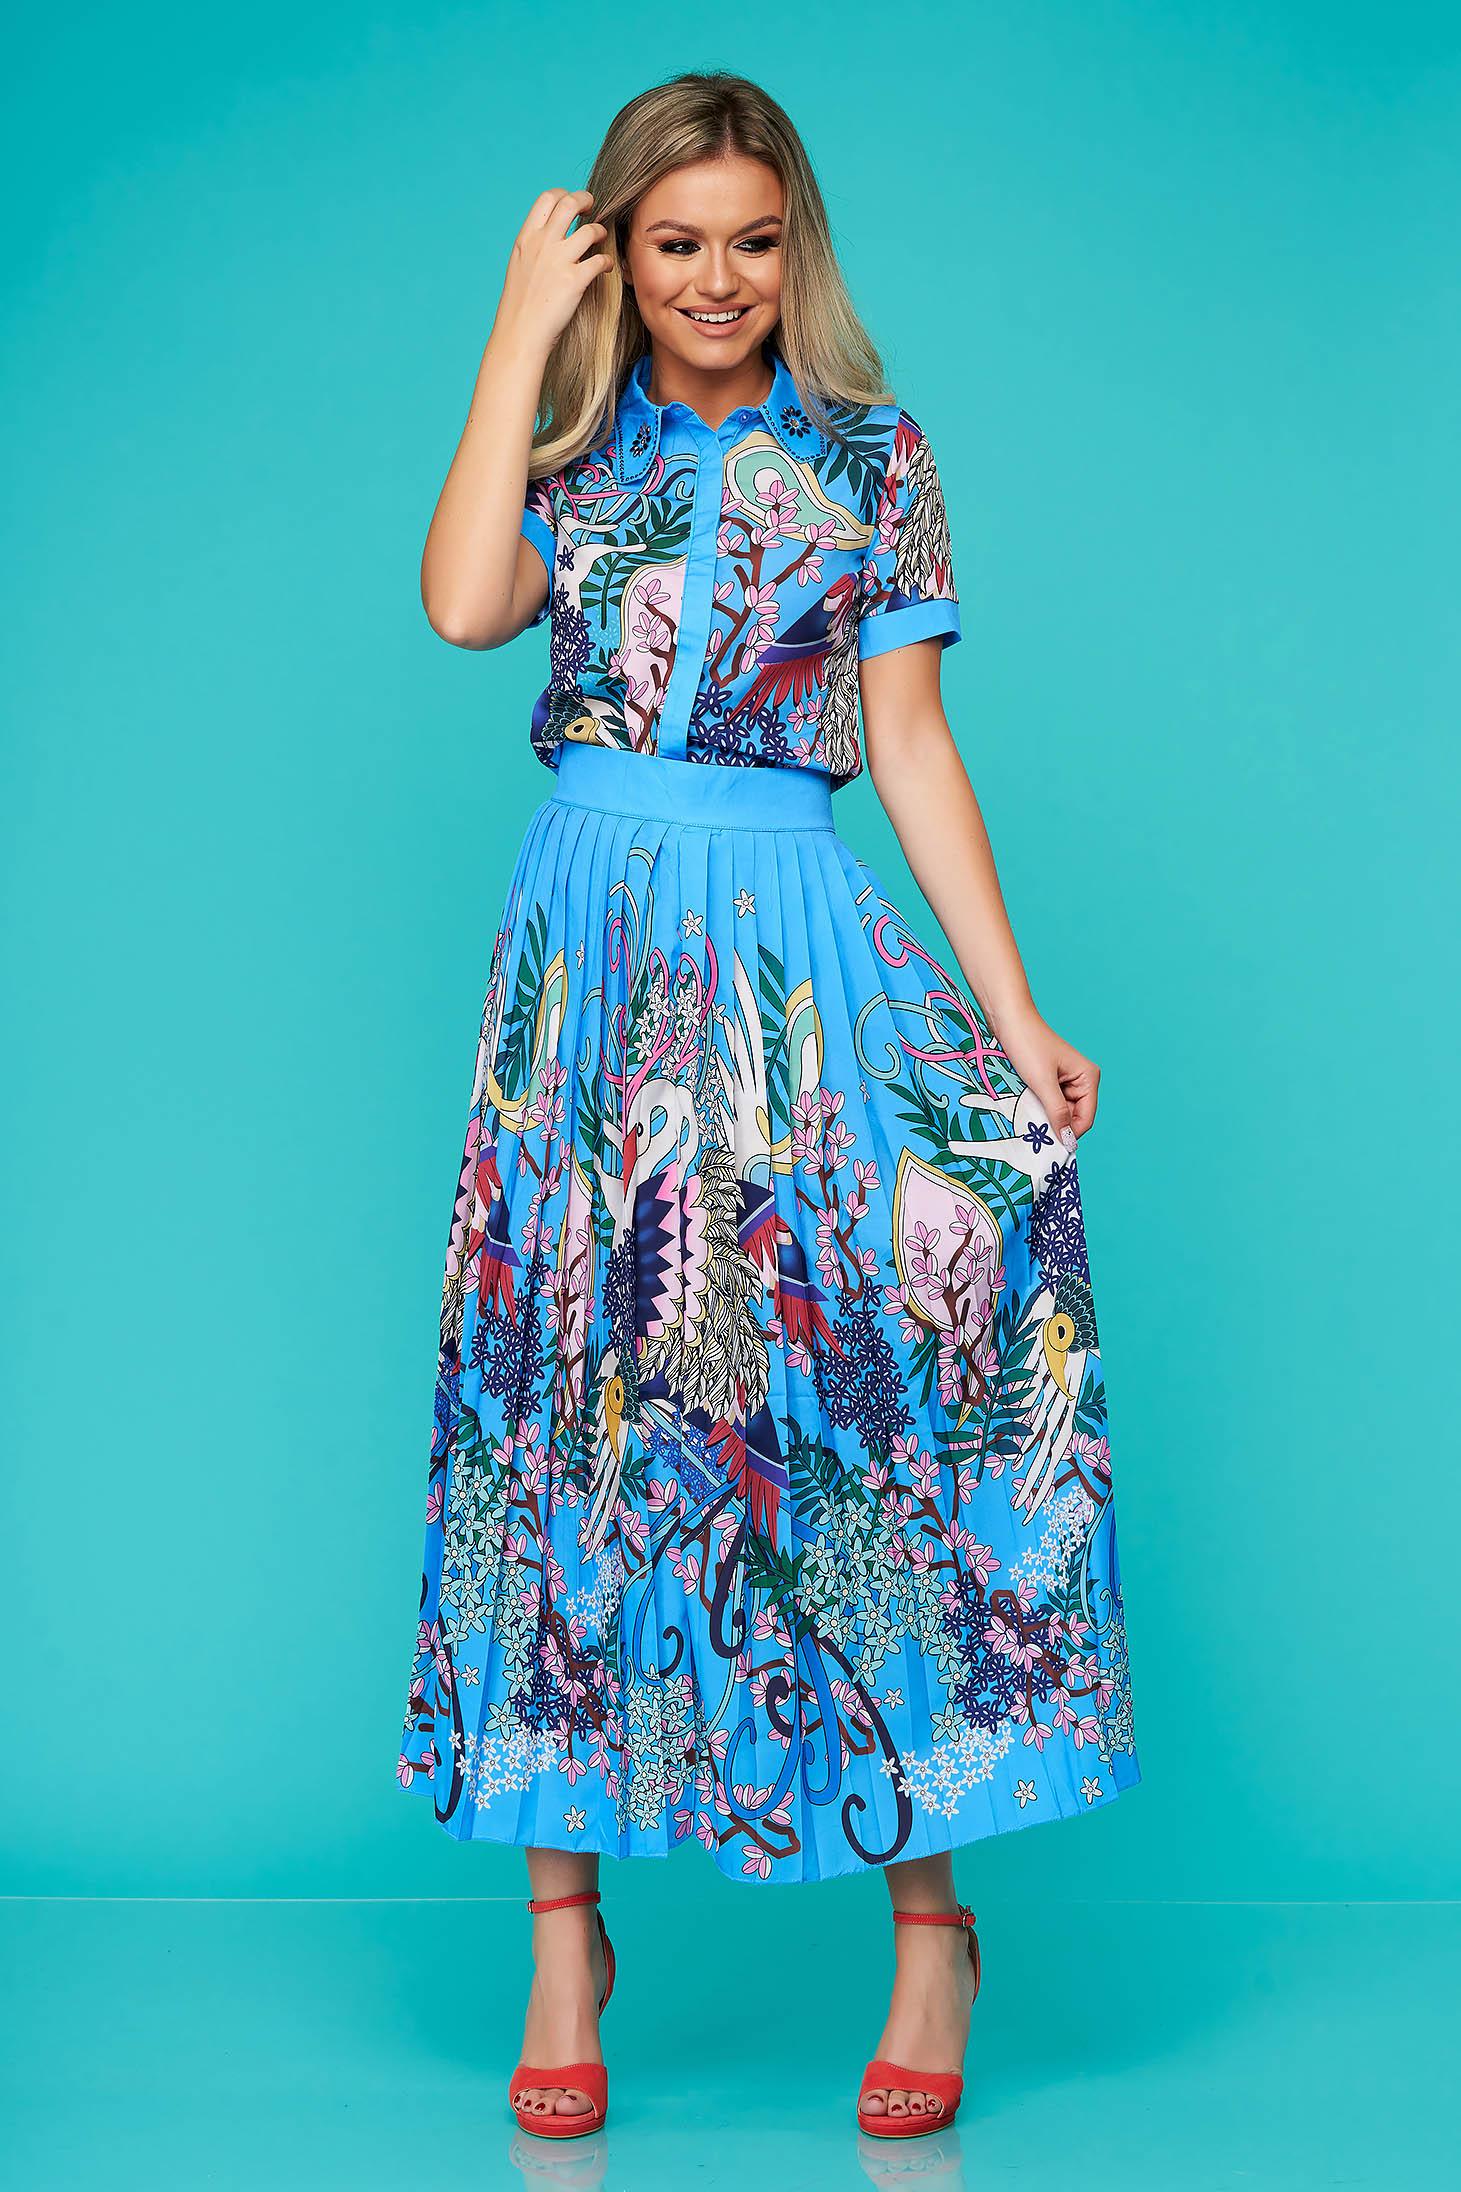 Compleu SunShine albastru elegant cu fusta plisata si imprimeuri grafice